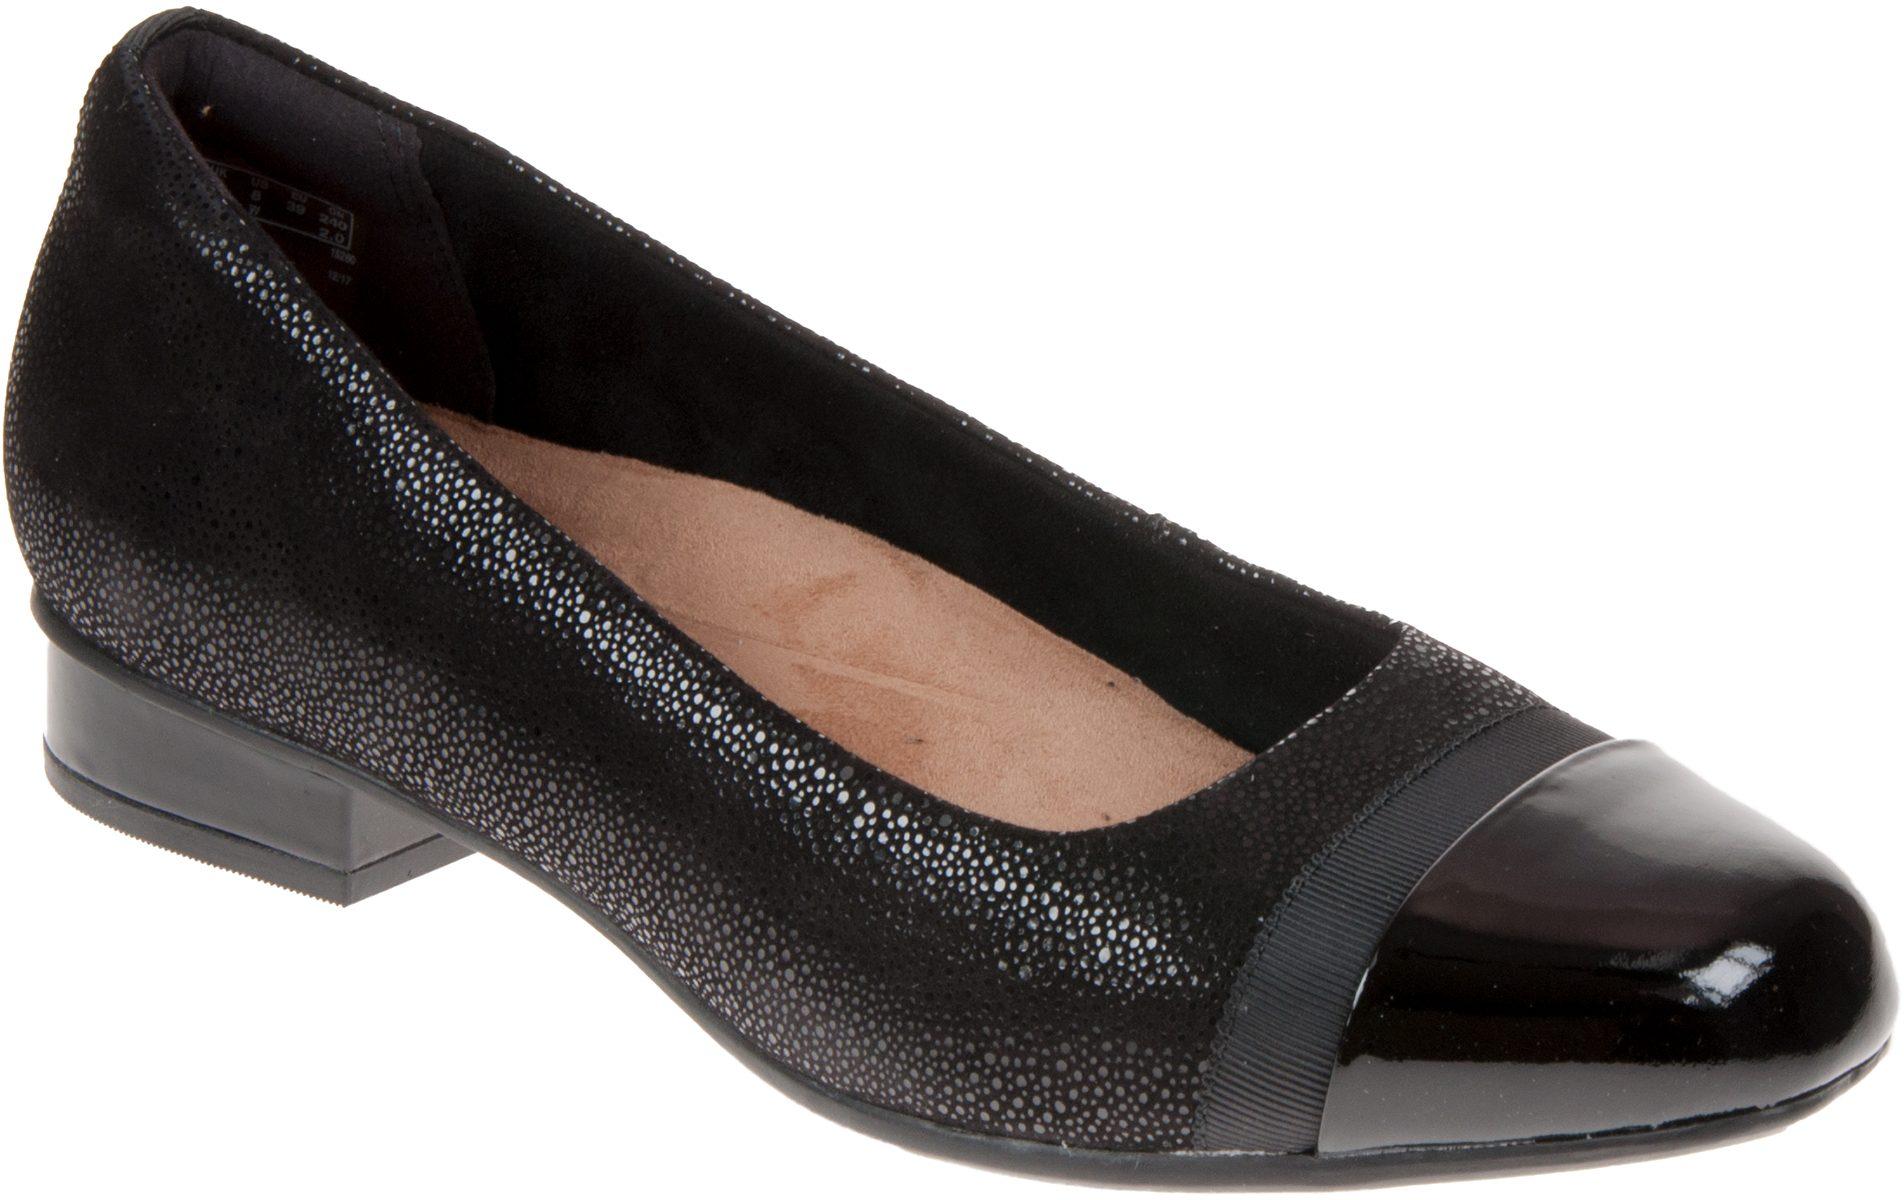 d836959811 Clarks Keesha Rosa Black Interest 26132359 - Everyday Shoes - Humphries  Shoes